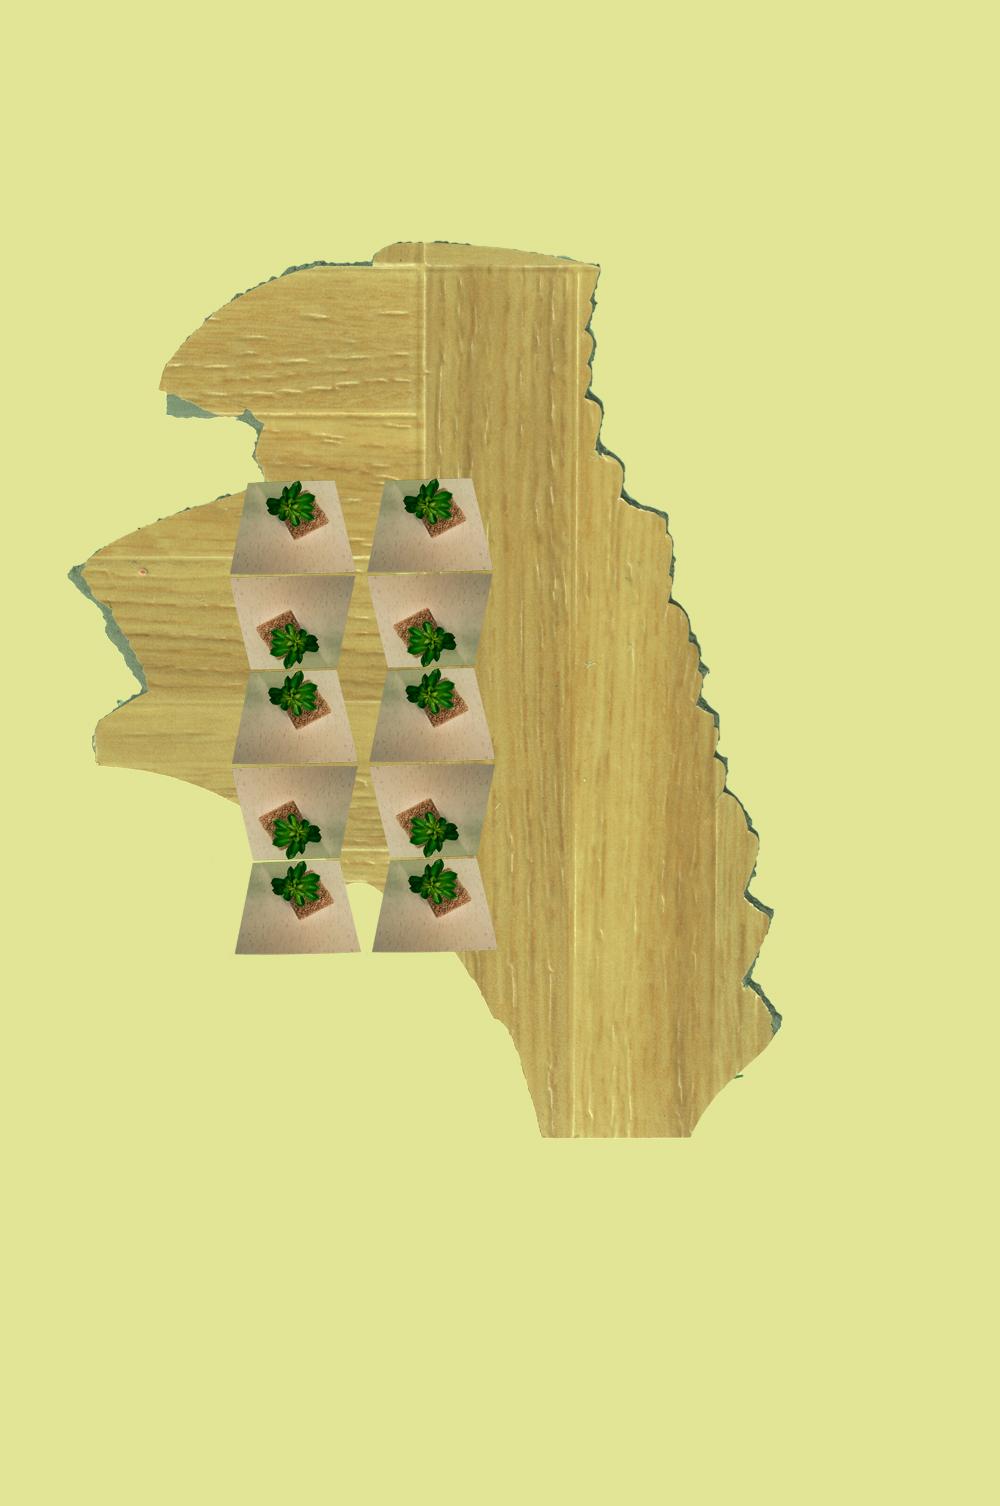 georgiaplantstack-1.jpg